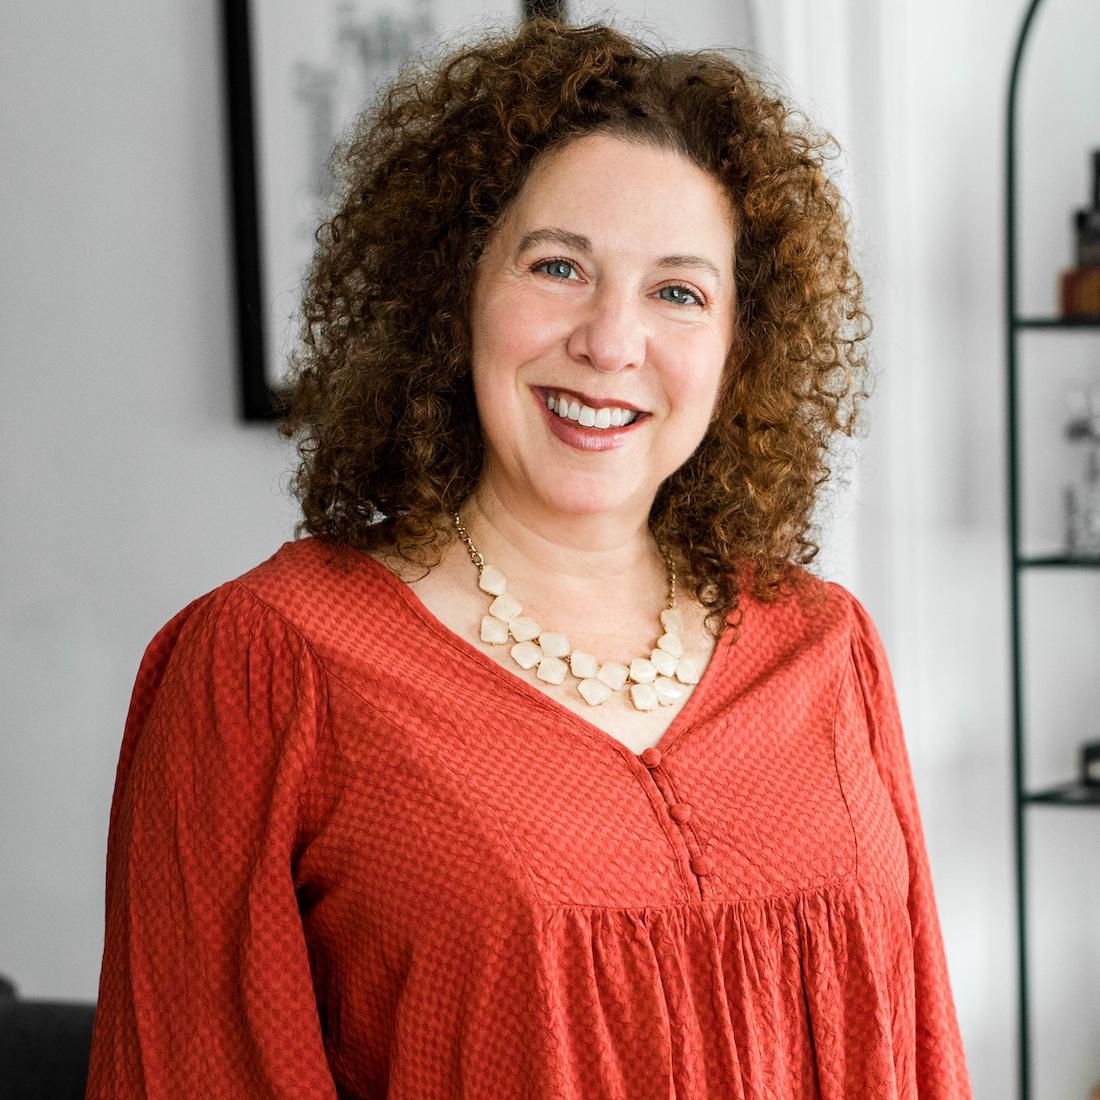 Lynne Golodner